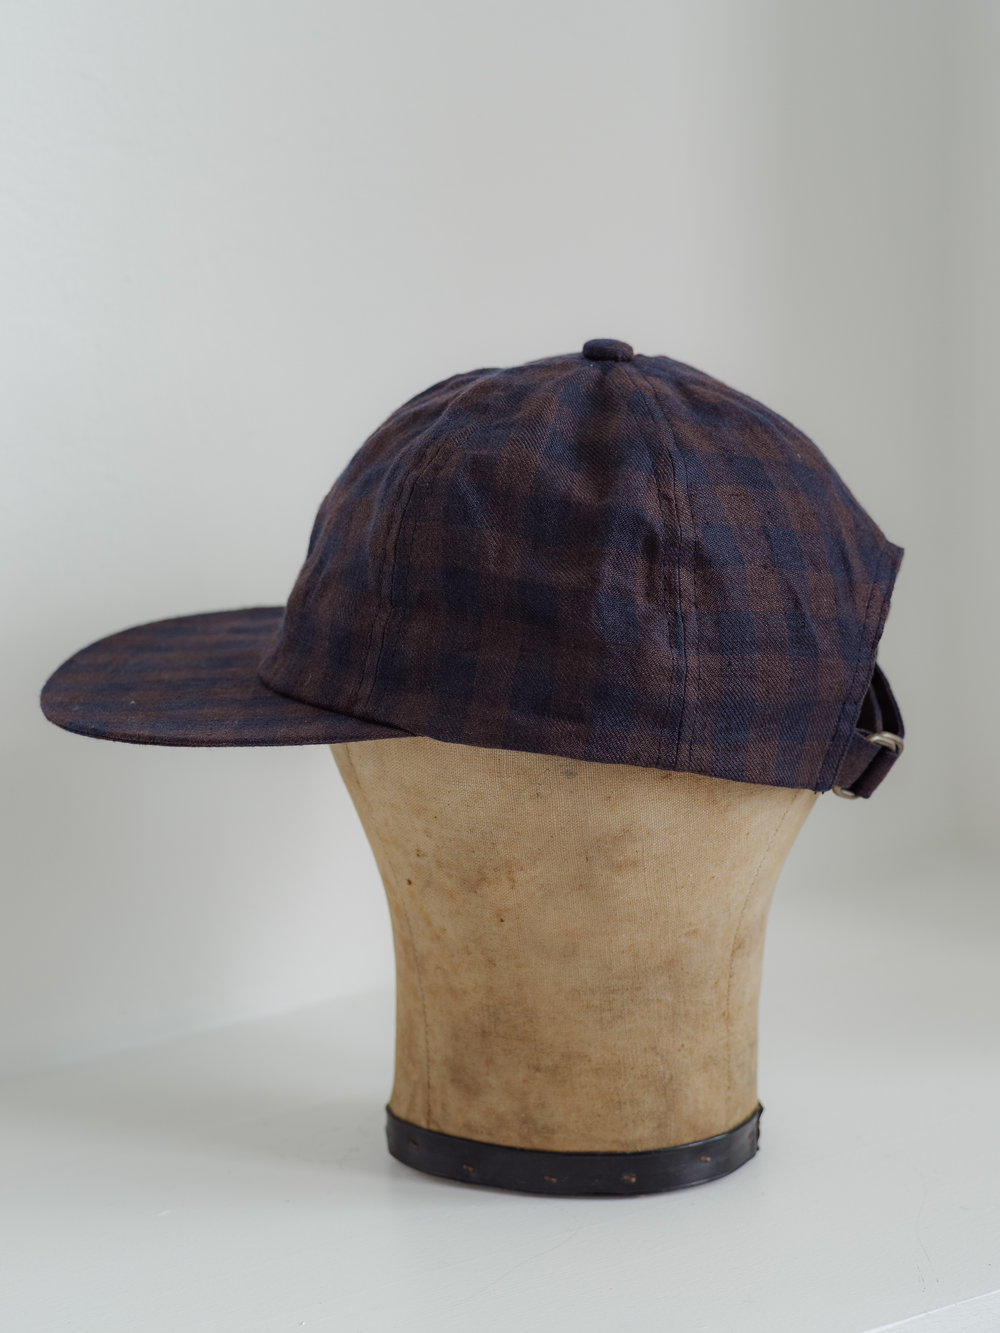 evan-kinori-ouji-yamada-handmade-hat-1